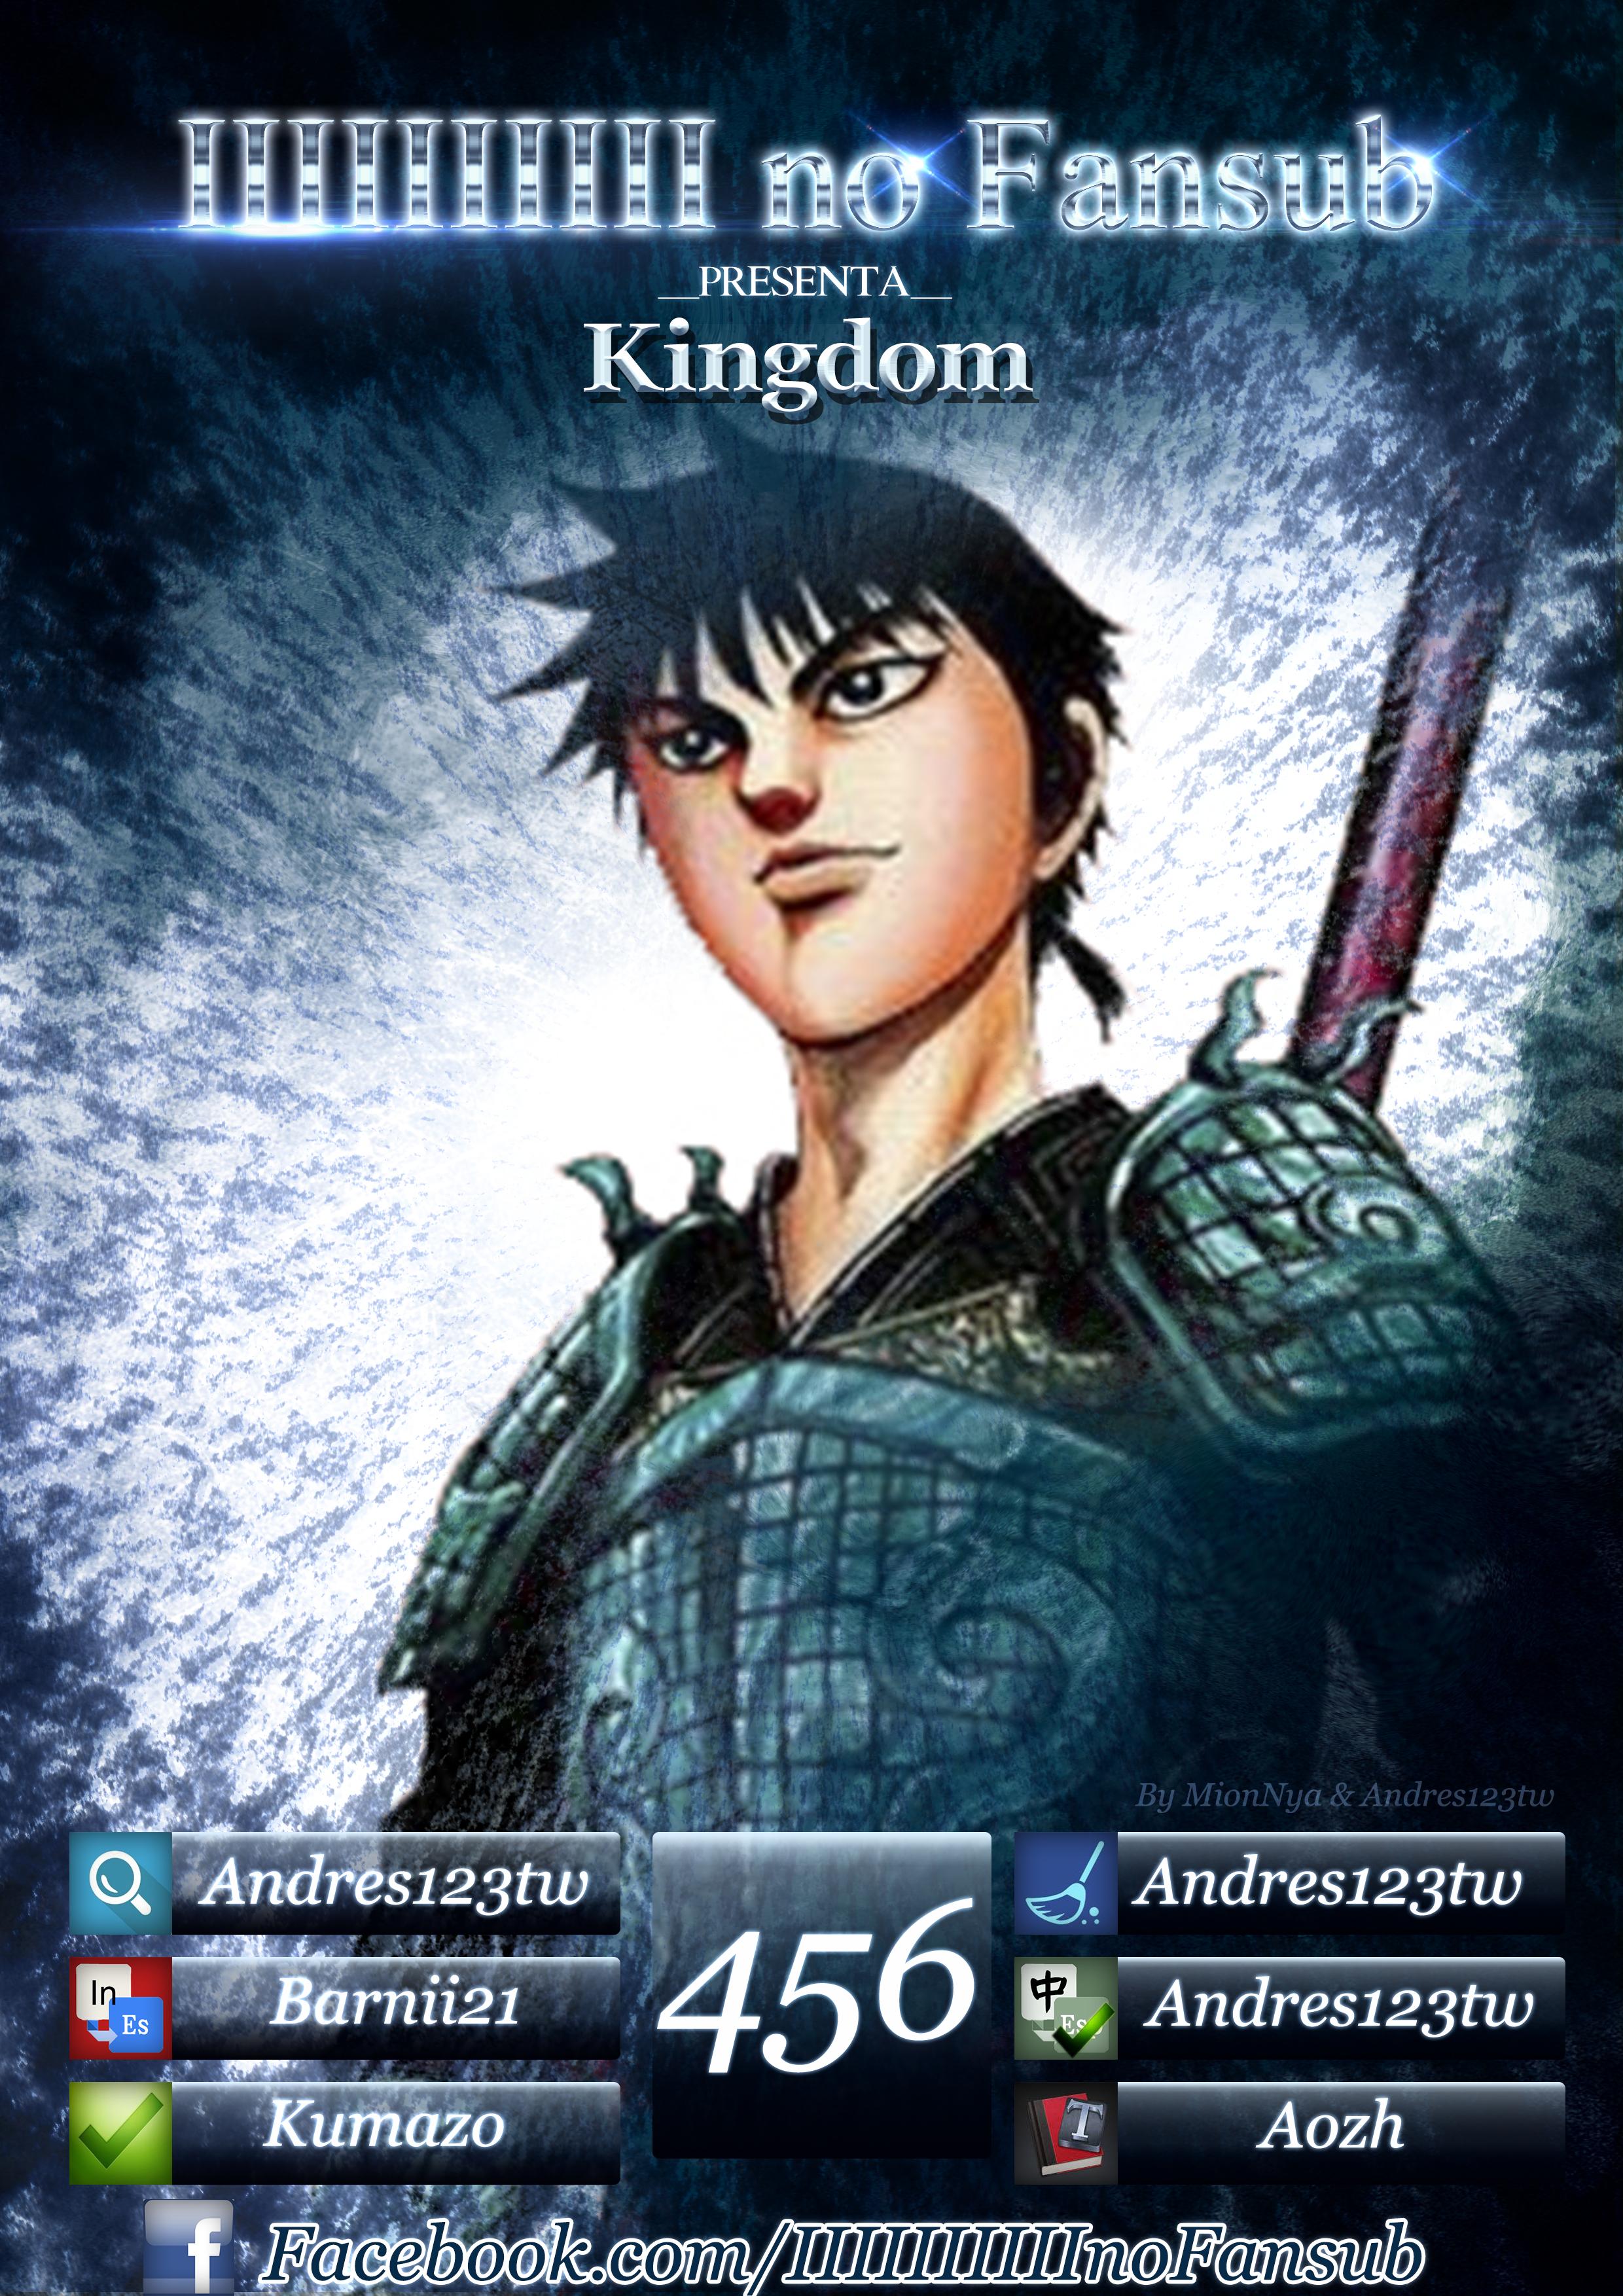 http://c5.ninemanga.com/es_manga/19/12307/433389/f933d5c2b1cf9fd42ec839ef9648bf46.jpg Page 1